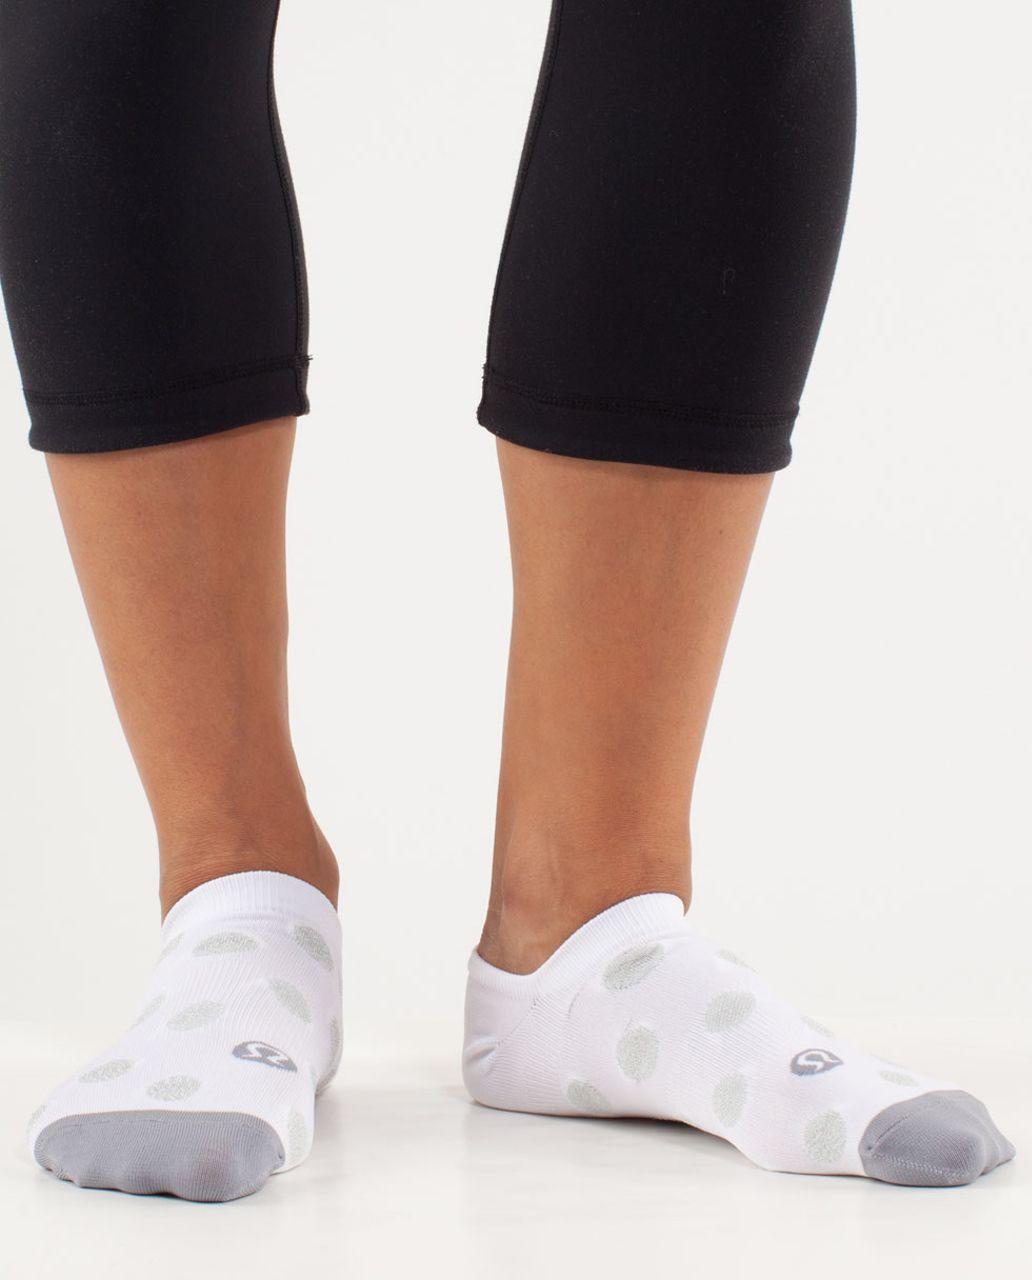 Lululemon Women's Featherweight Sock - White Kdk Dot / Fossil